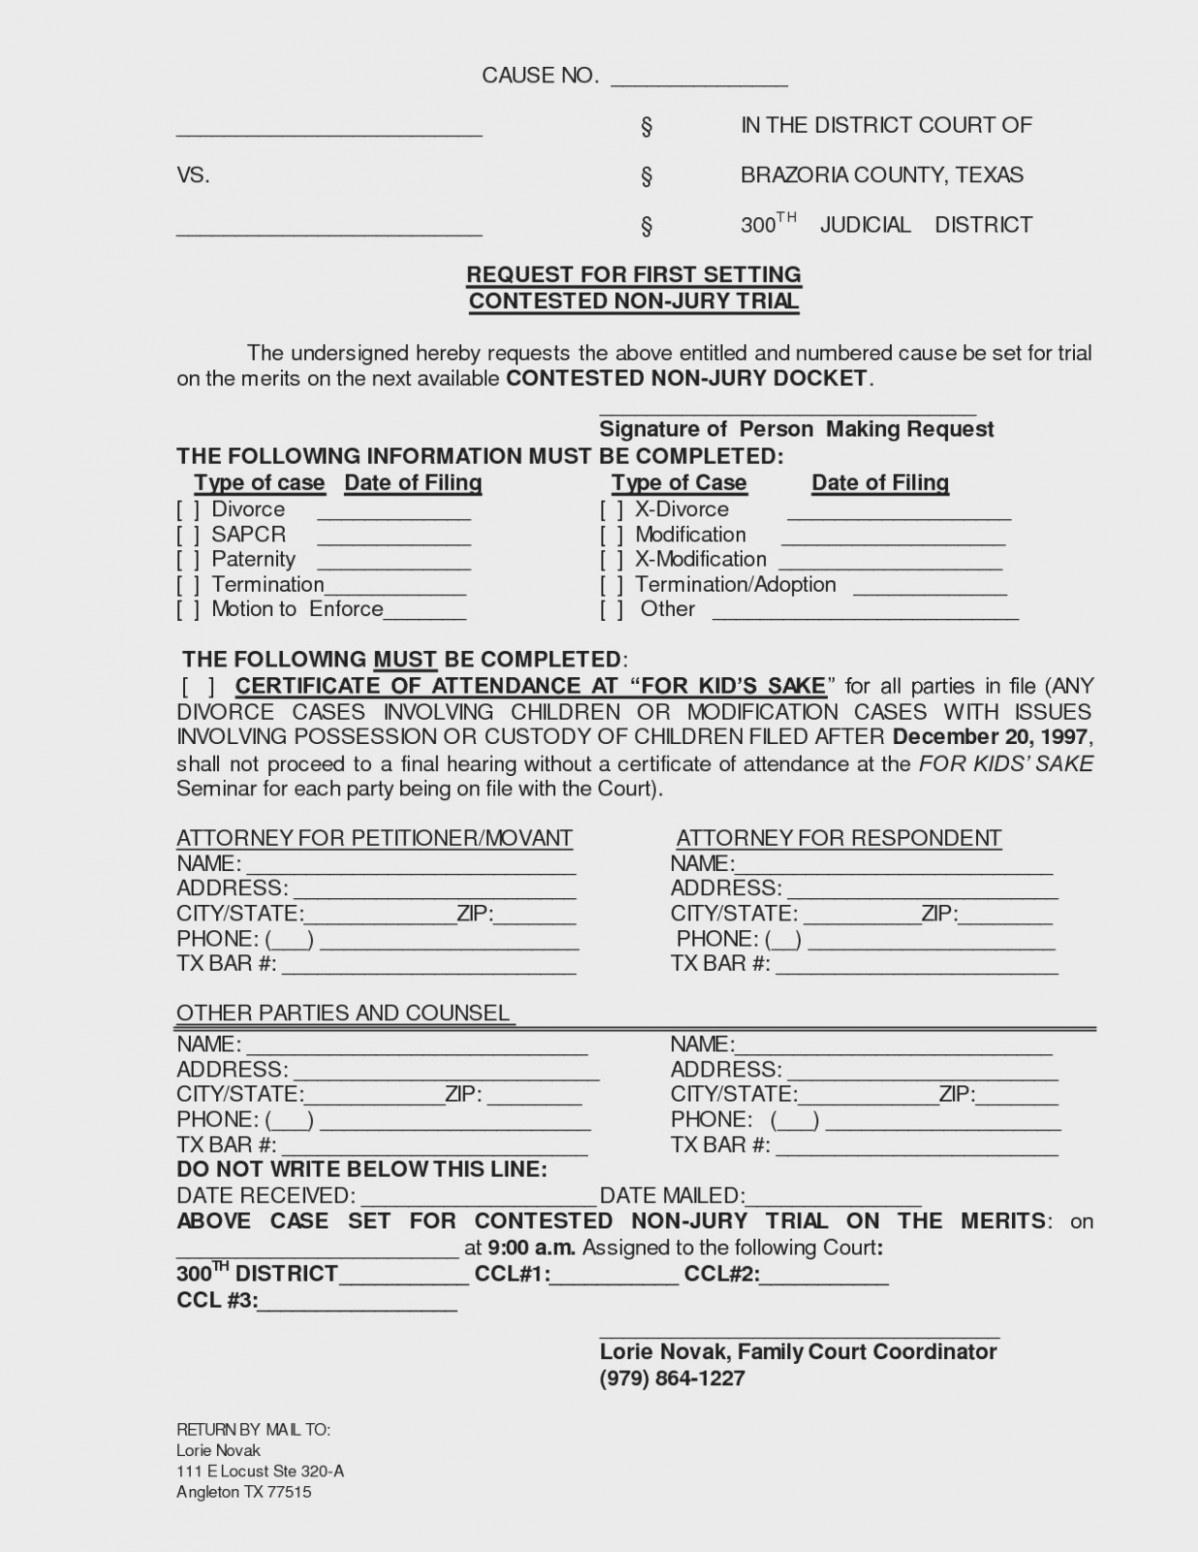 Texas Divorce Decree Template Best Of Free Printable Divorce Papers - Free Printable Divorce Forms Texas